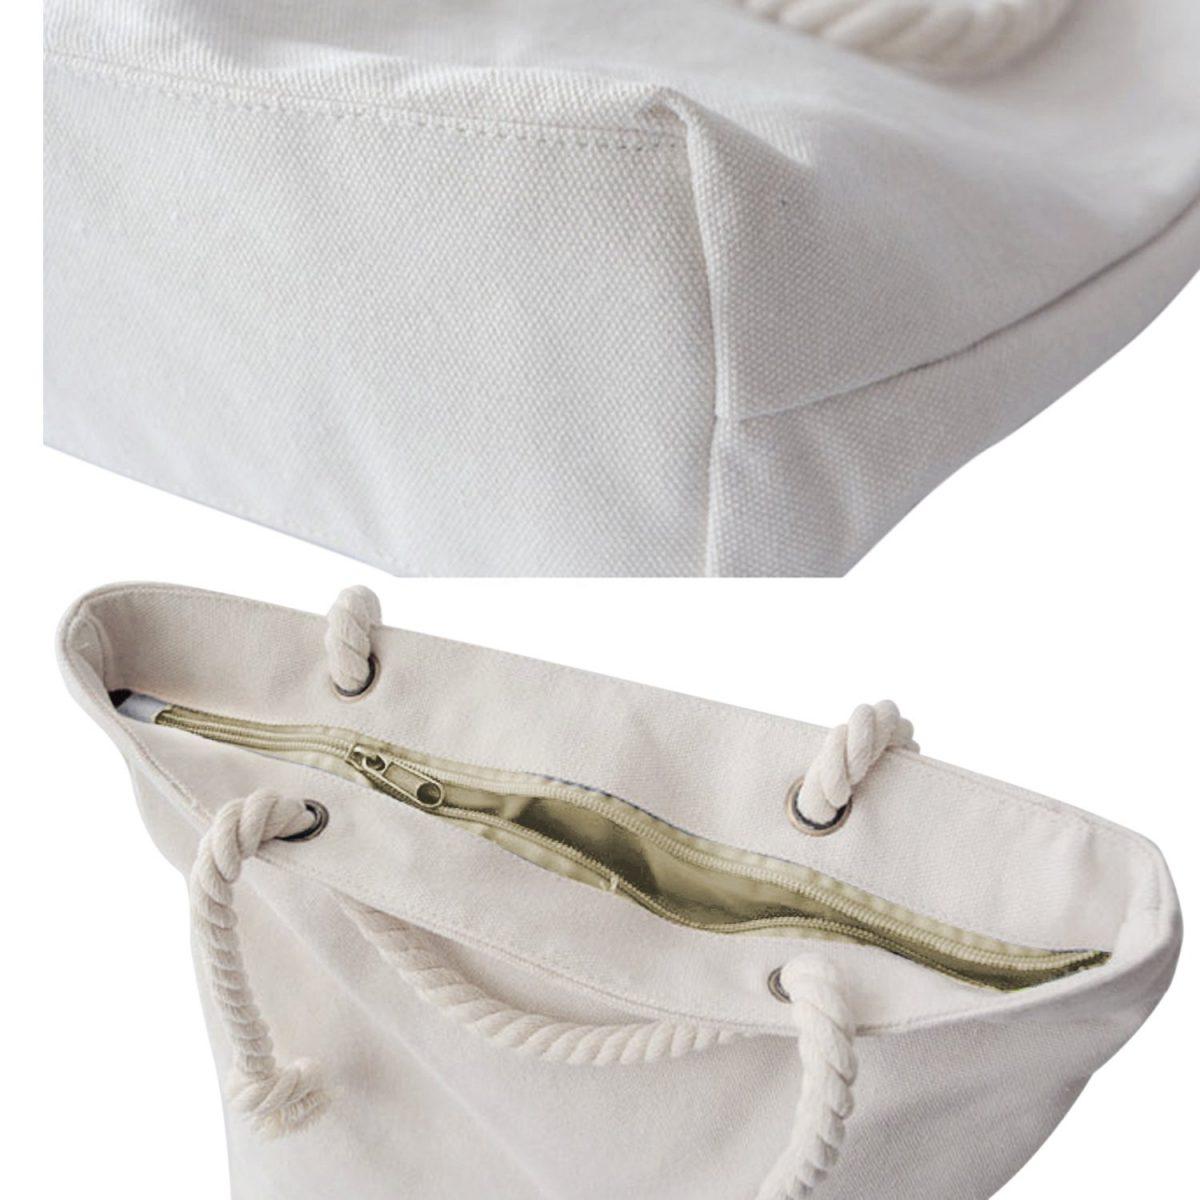 Lila Renk Demet Zambak Motifli Fermuarlı Modern Kumaş Çanta Realhomes